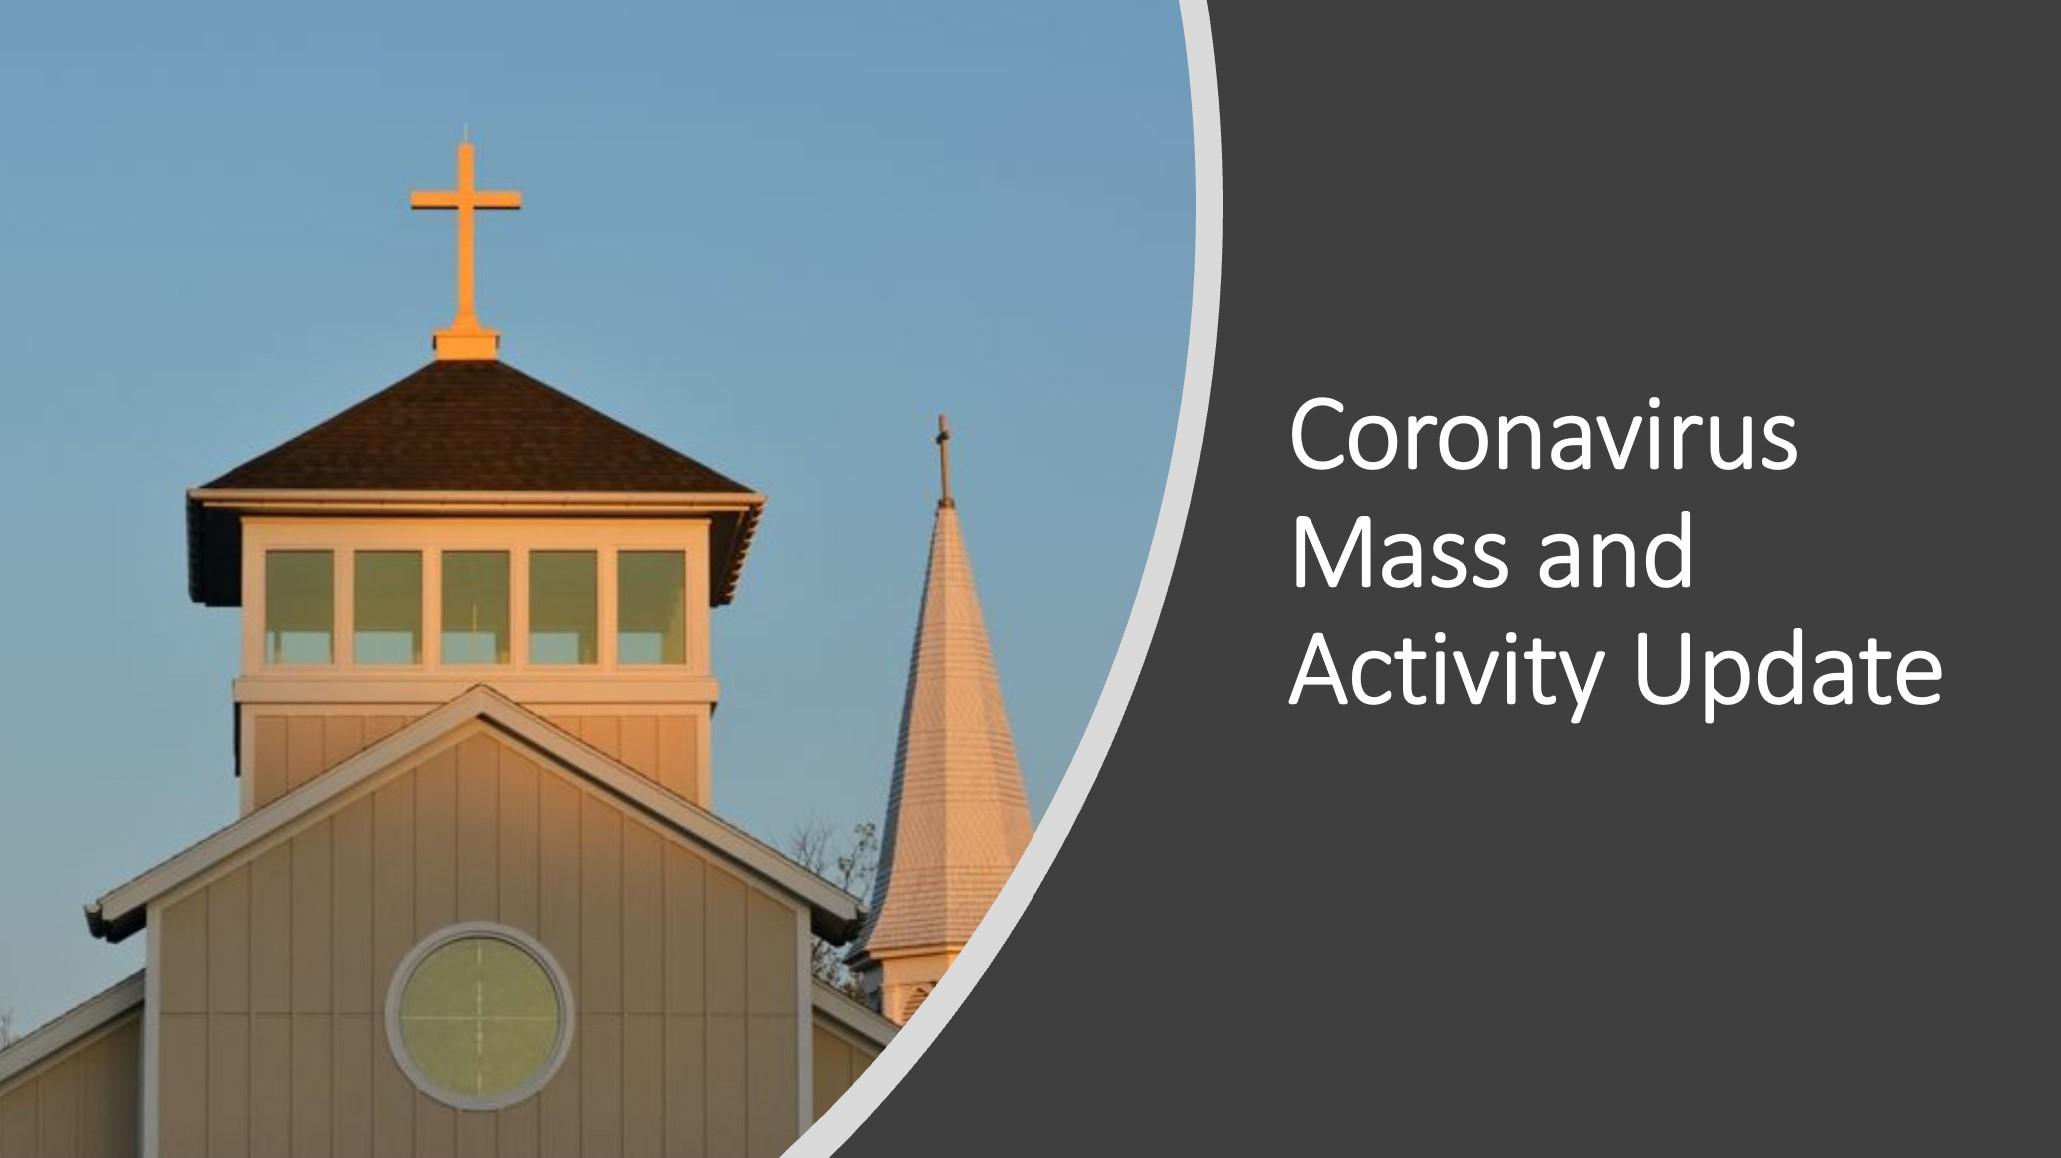 , Coronavirus Mass and Activity Update, St. Joseph-on-Carrollton Manor Catholic Church, St. Joseph-on-Carrollton Manor Catholic Church